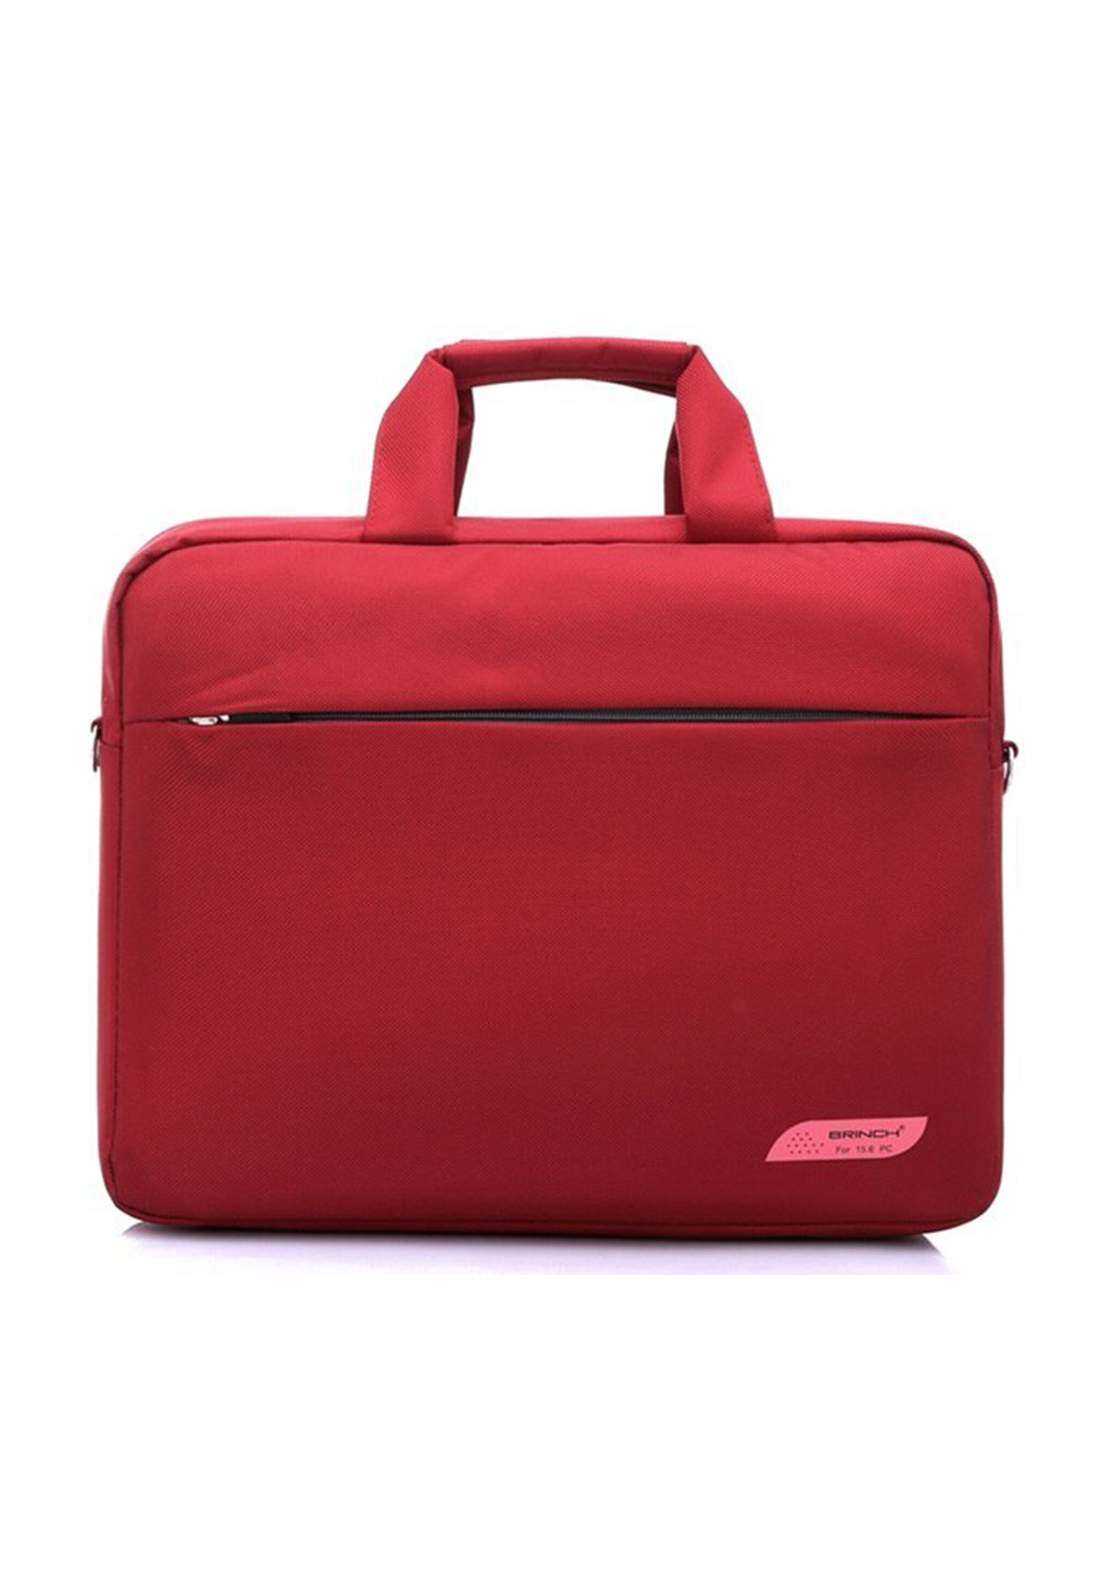 "SS-206  15.6"" Laptop Bag - Red  حقيبة لابتوب"